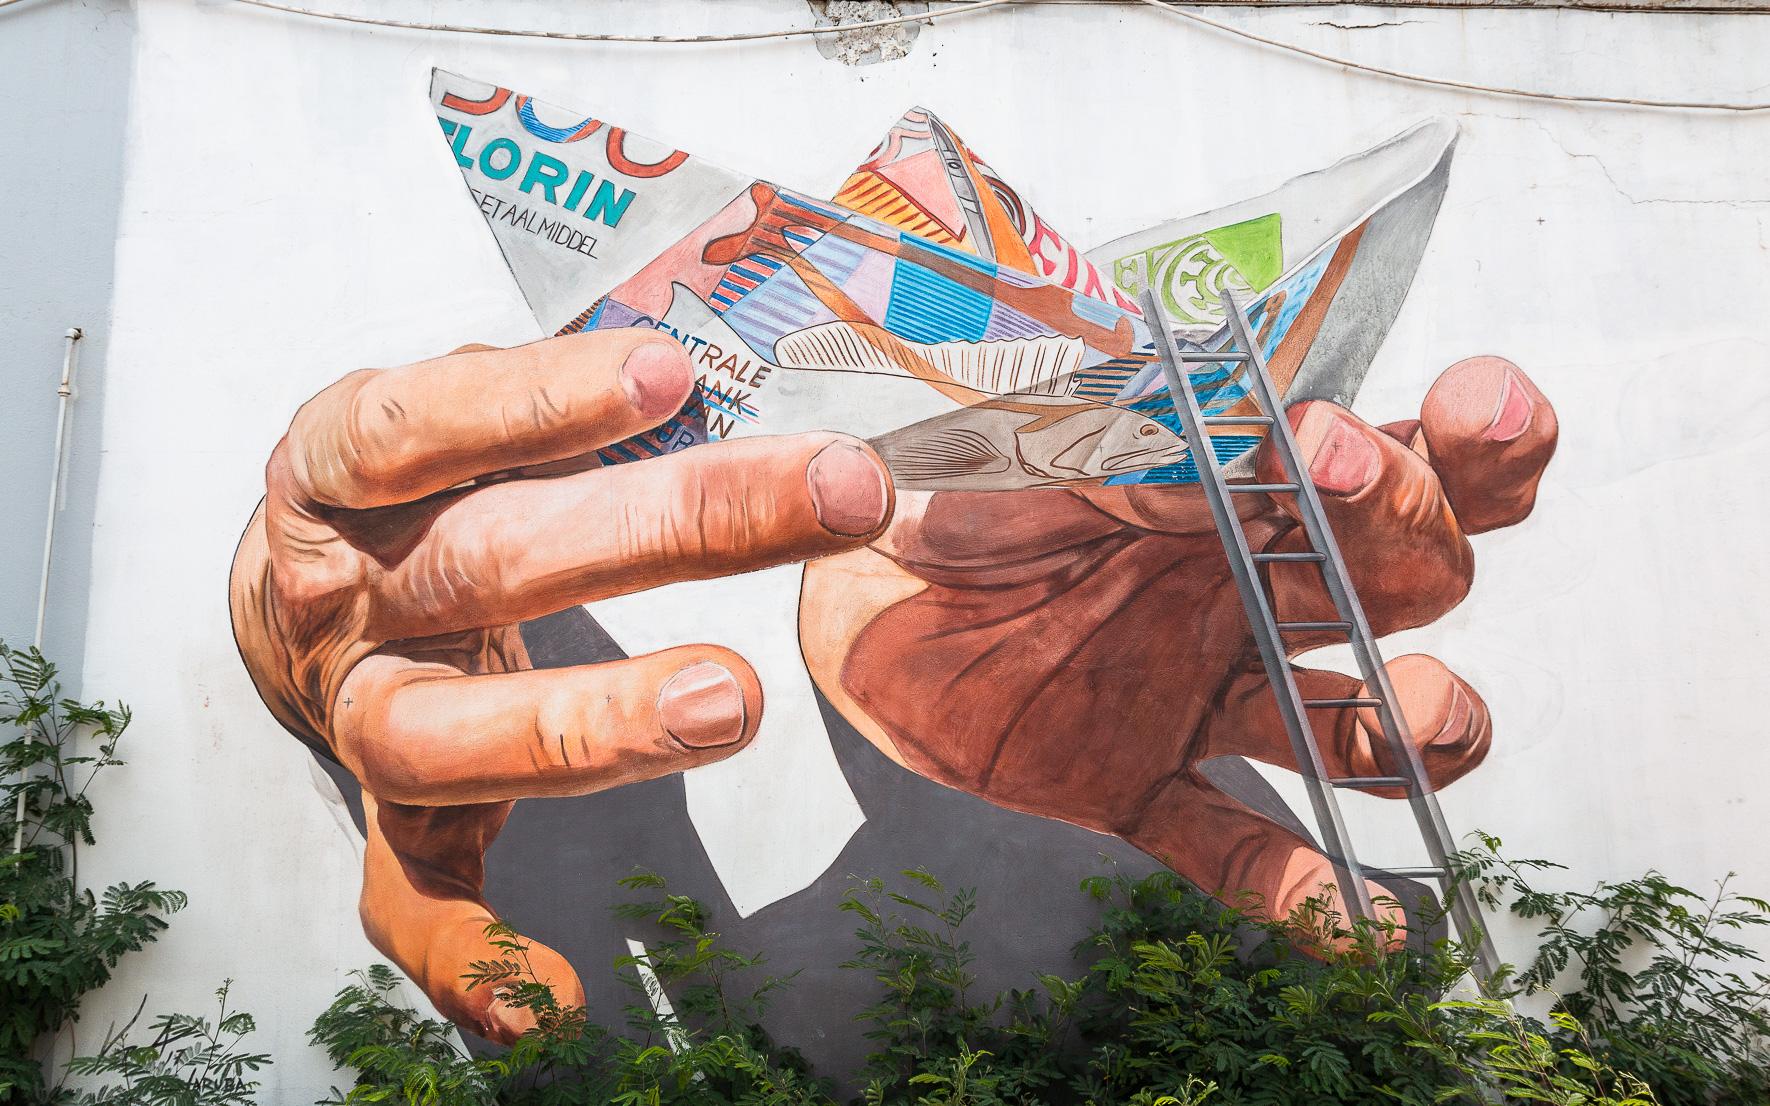 Florin Street Art Aruba, St. Nicolas